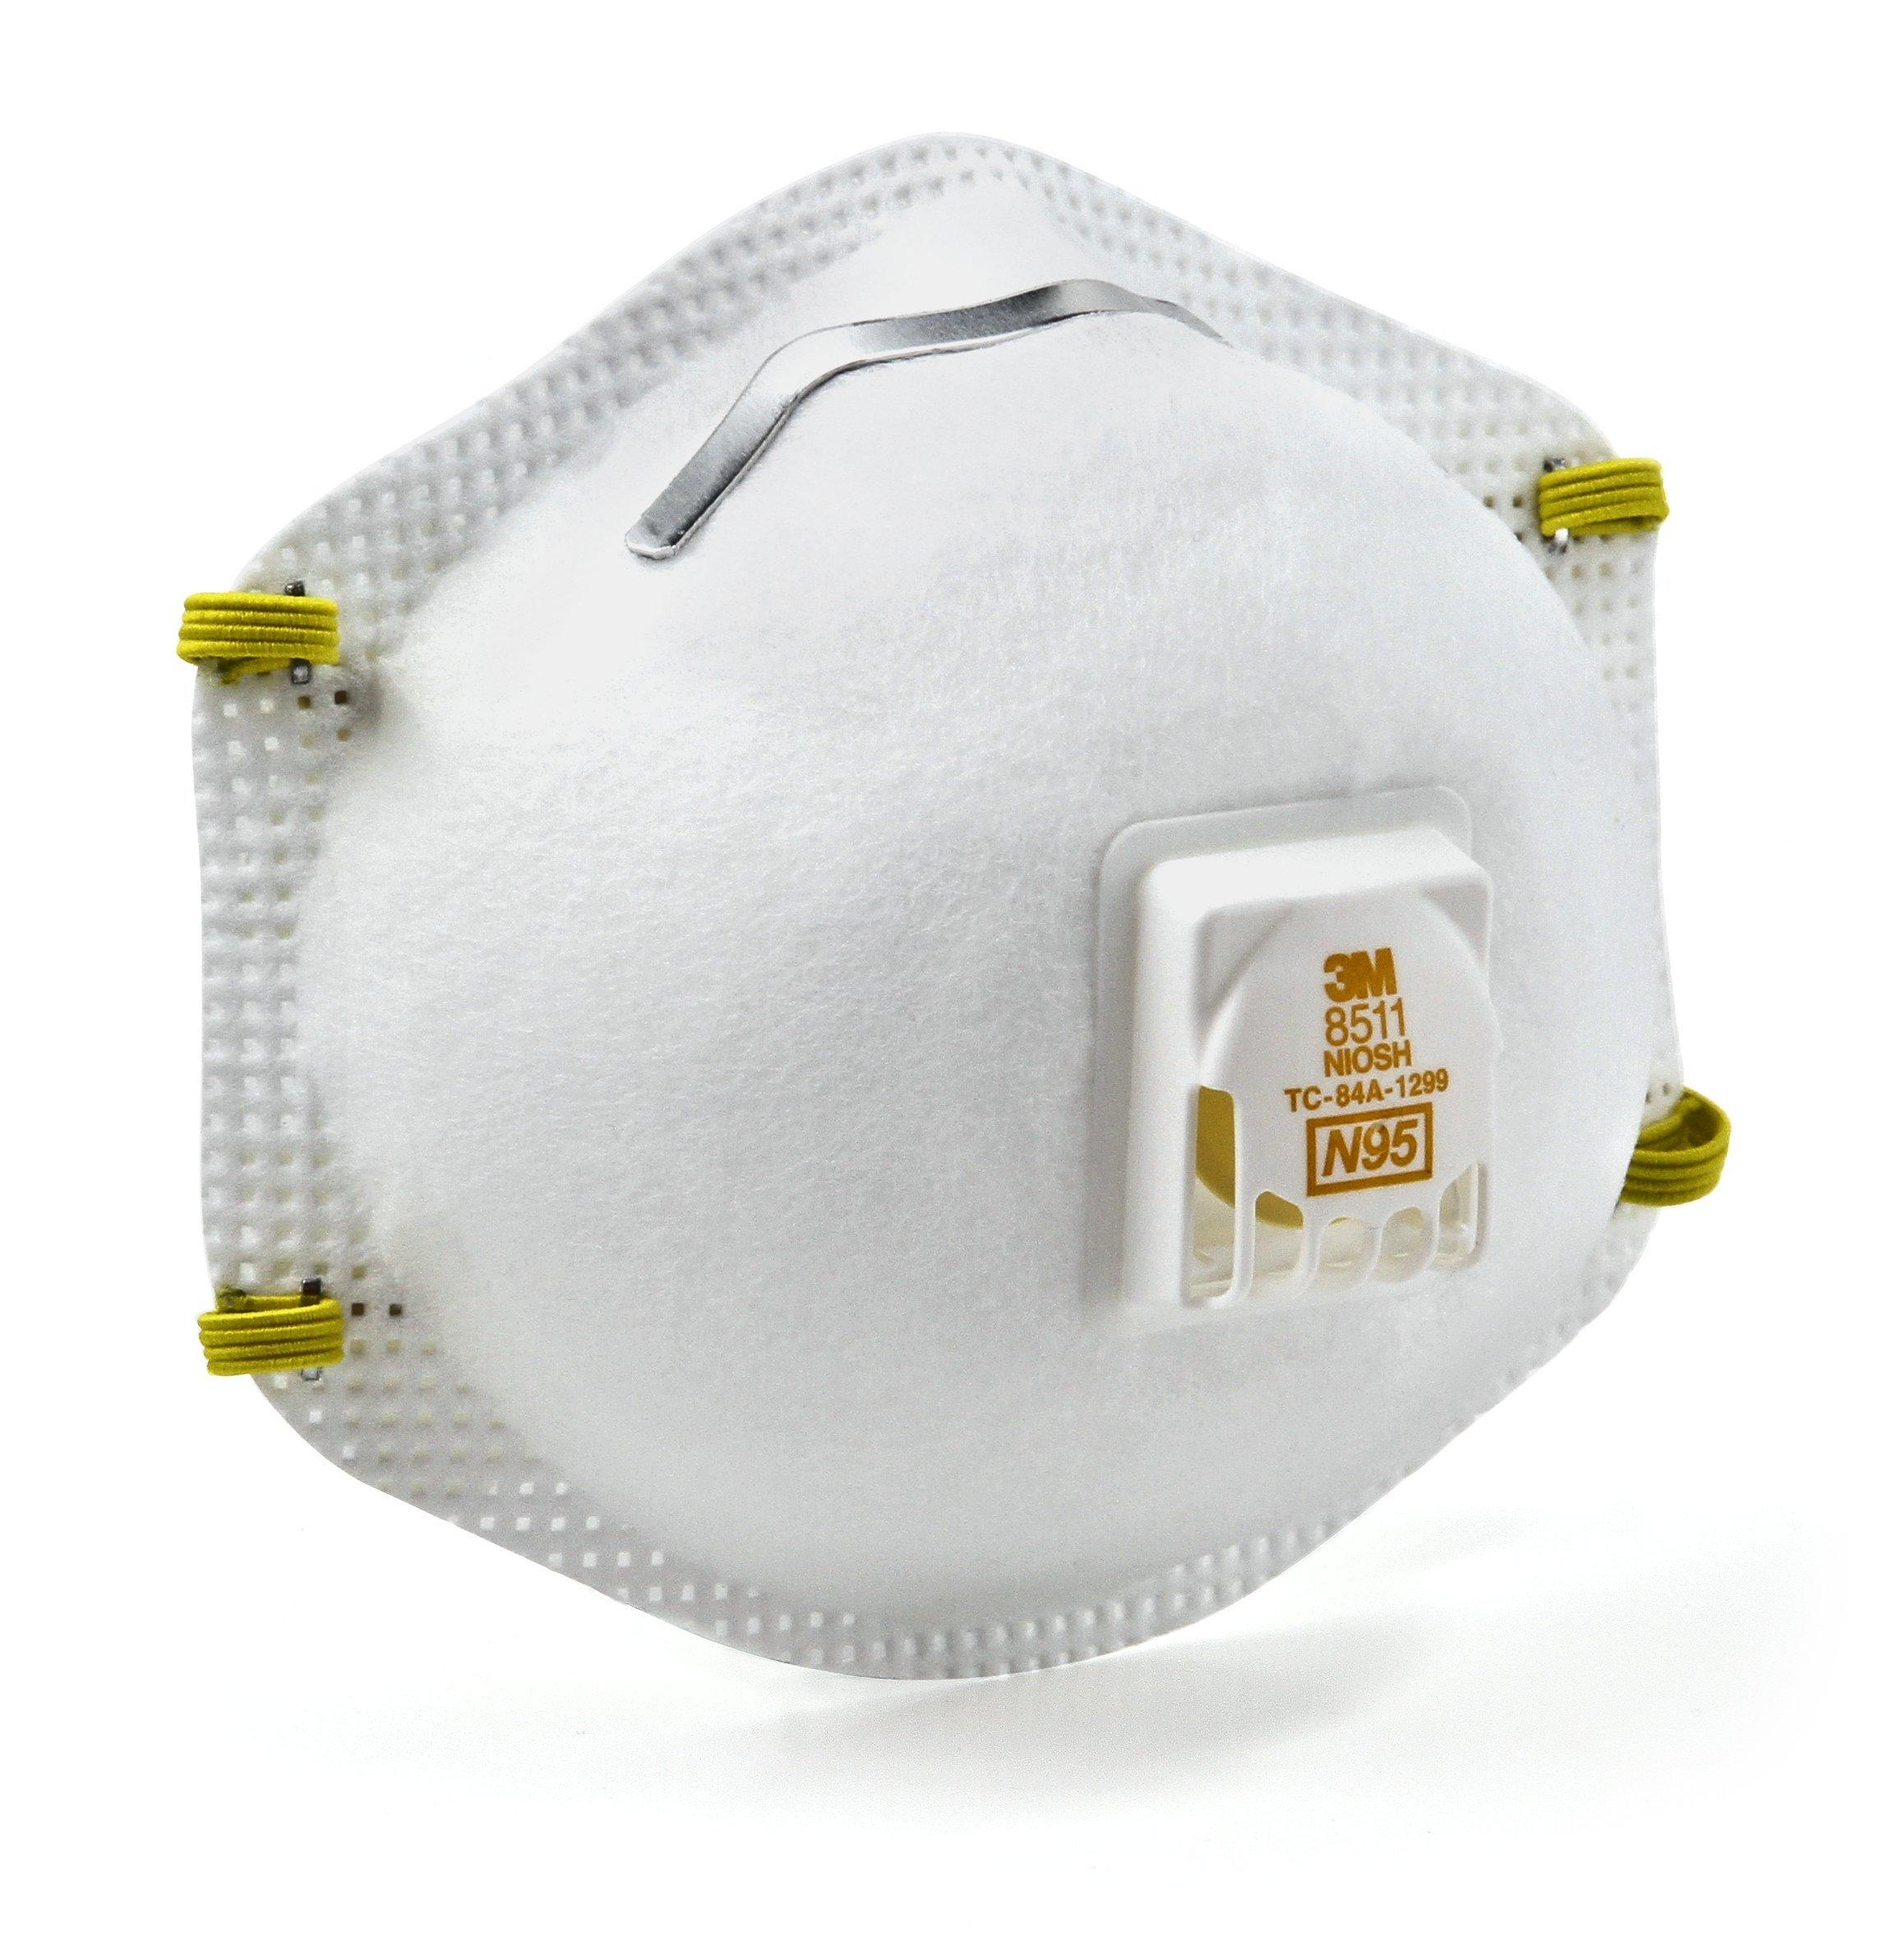 3M Valved Respirator 3